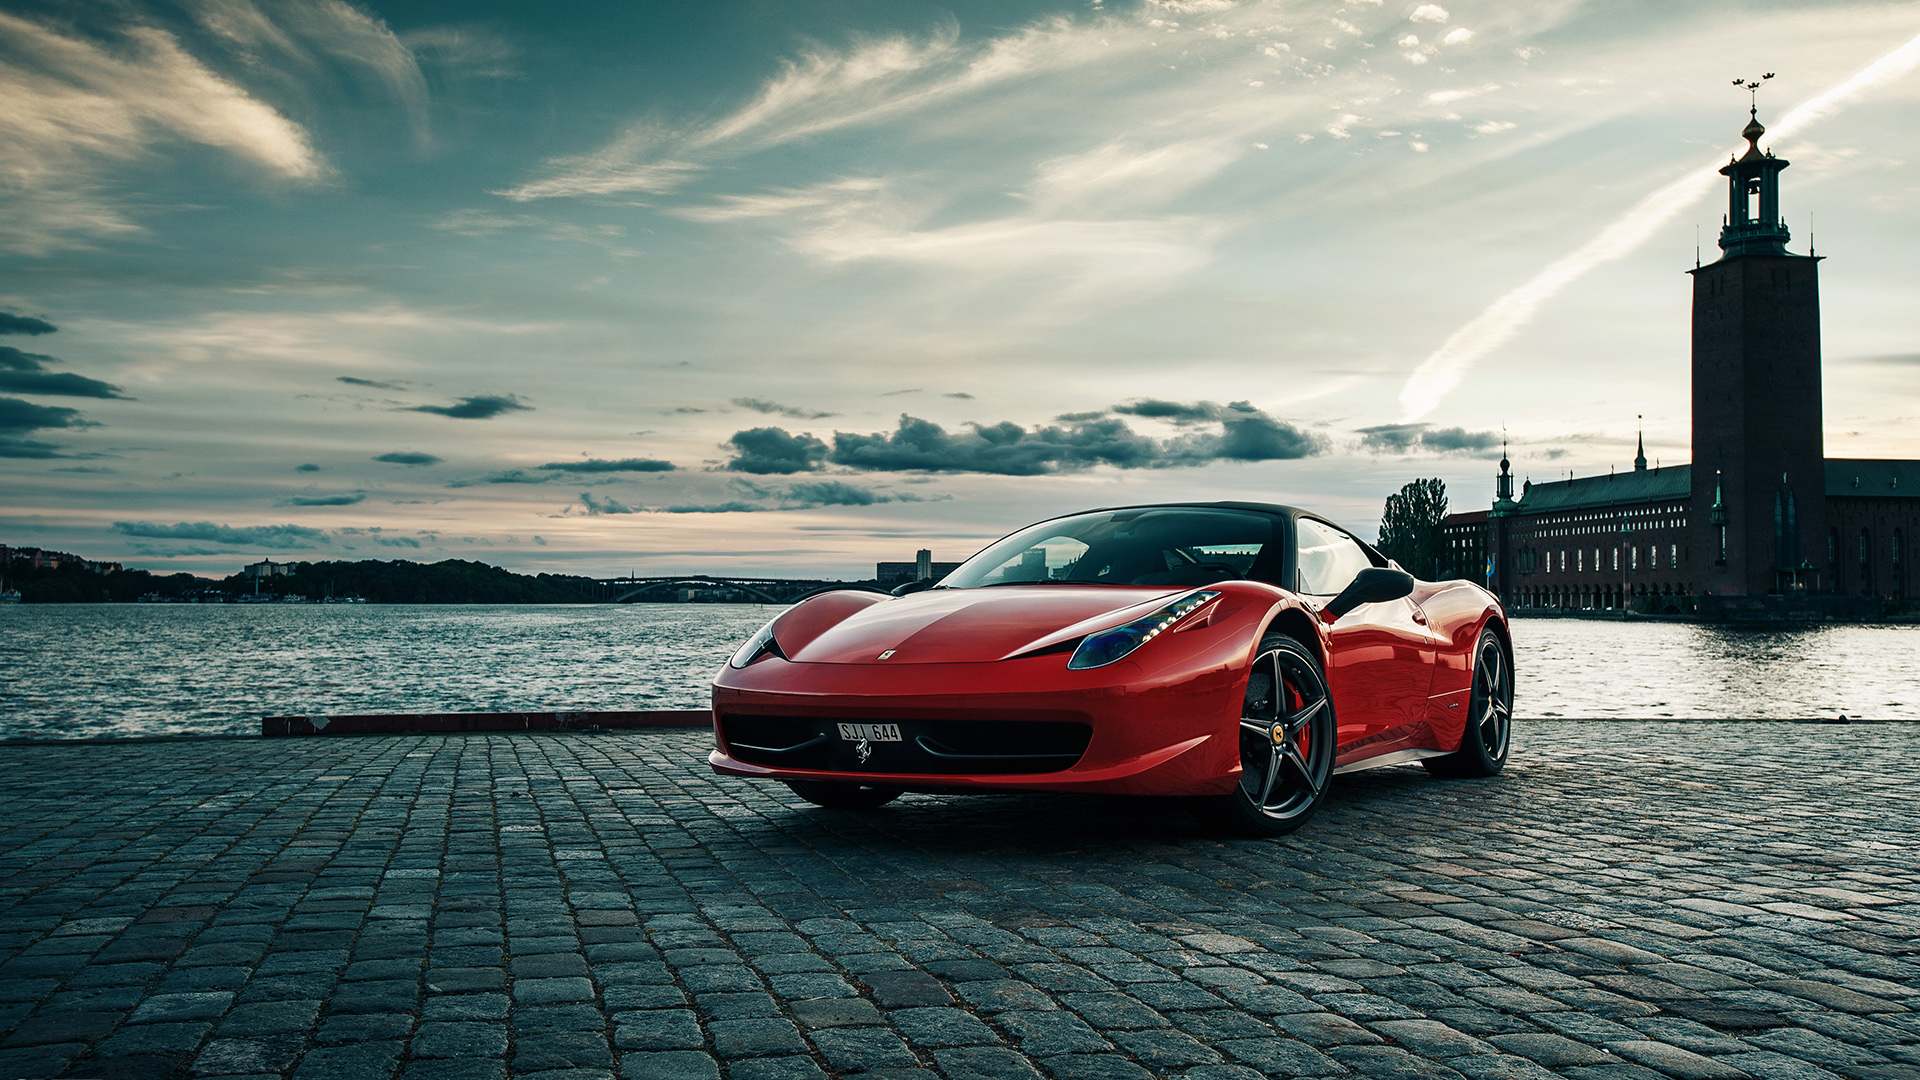 Ferrari 458 Italia 2013 Wallpaper HD Car Wallpapers 1920x1080